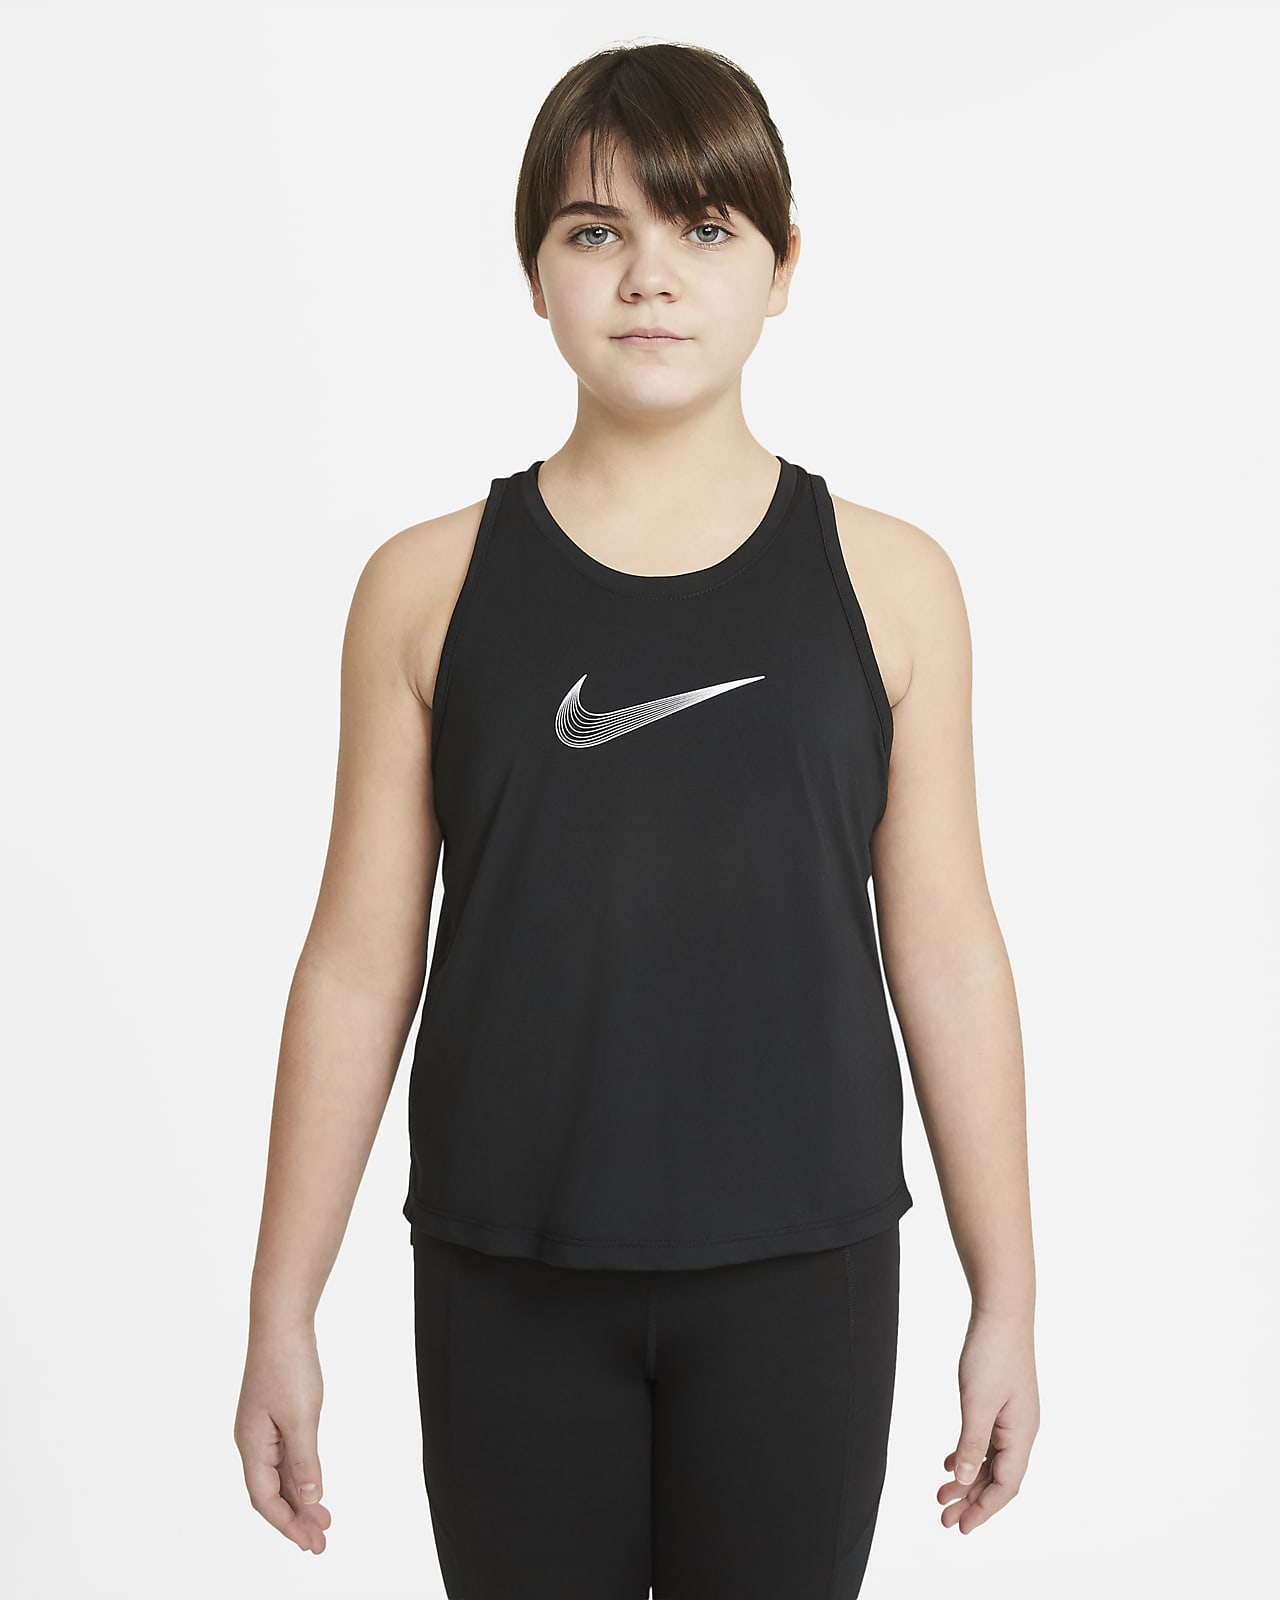 Canotta da training Nike Dri-FIT Trophy (Taglia grande) - Ragazza